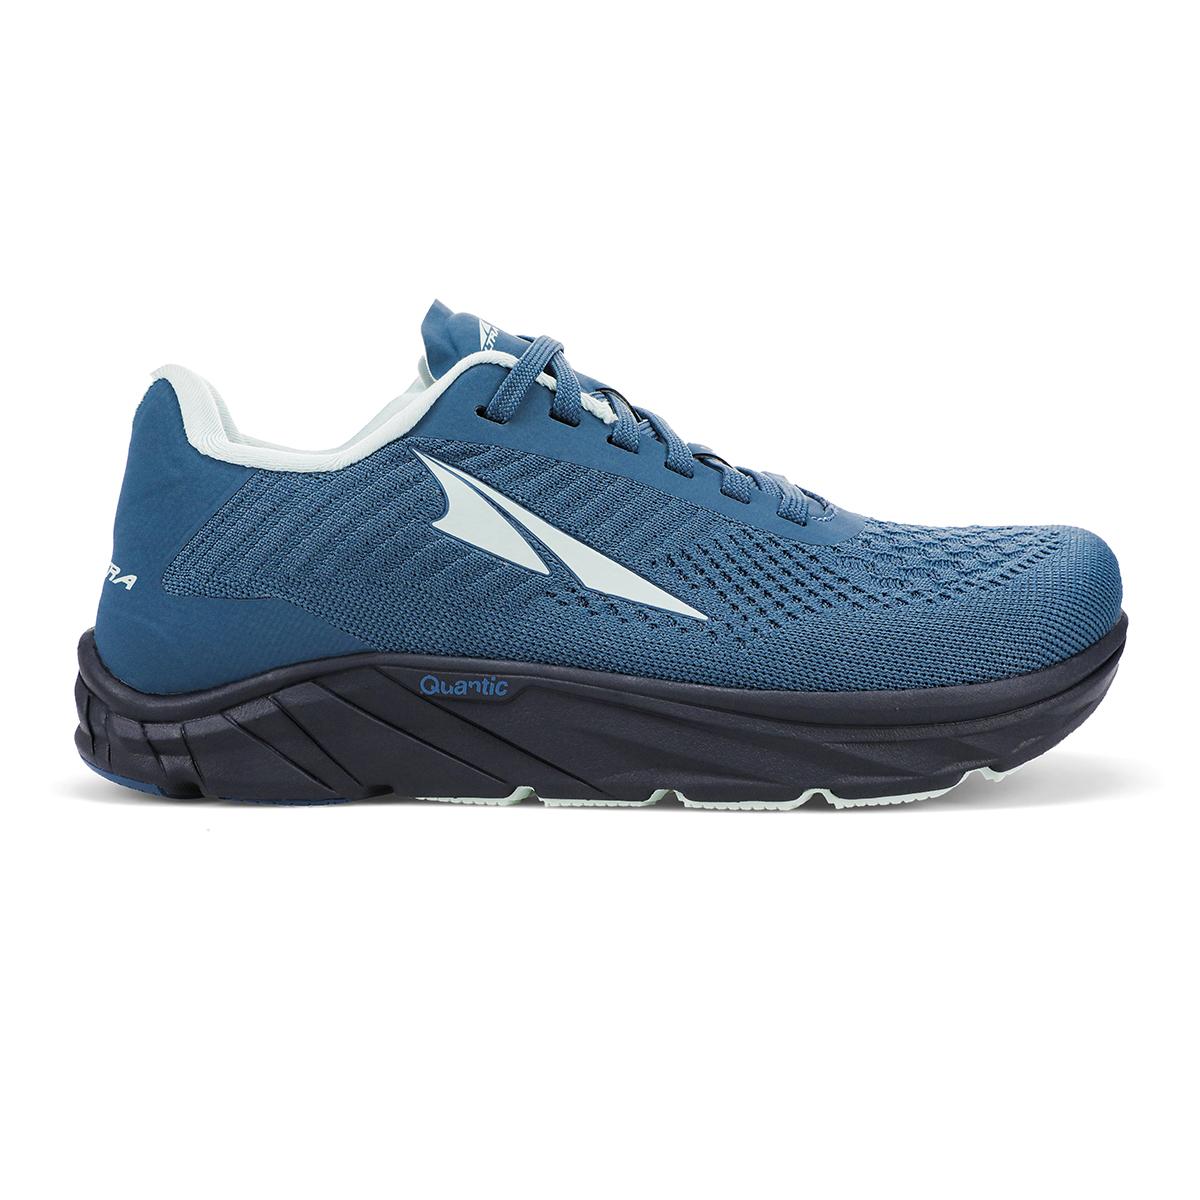 Women's Altra Torin 4.5 Plush Running Shoe - Color: Blue - Size: 7 - Width: Regular, Blue, large, image 1